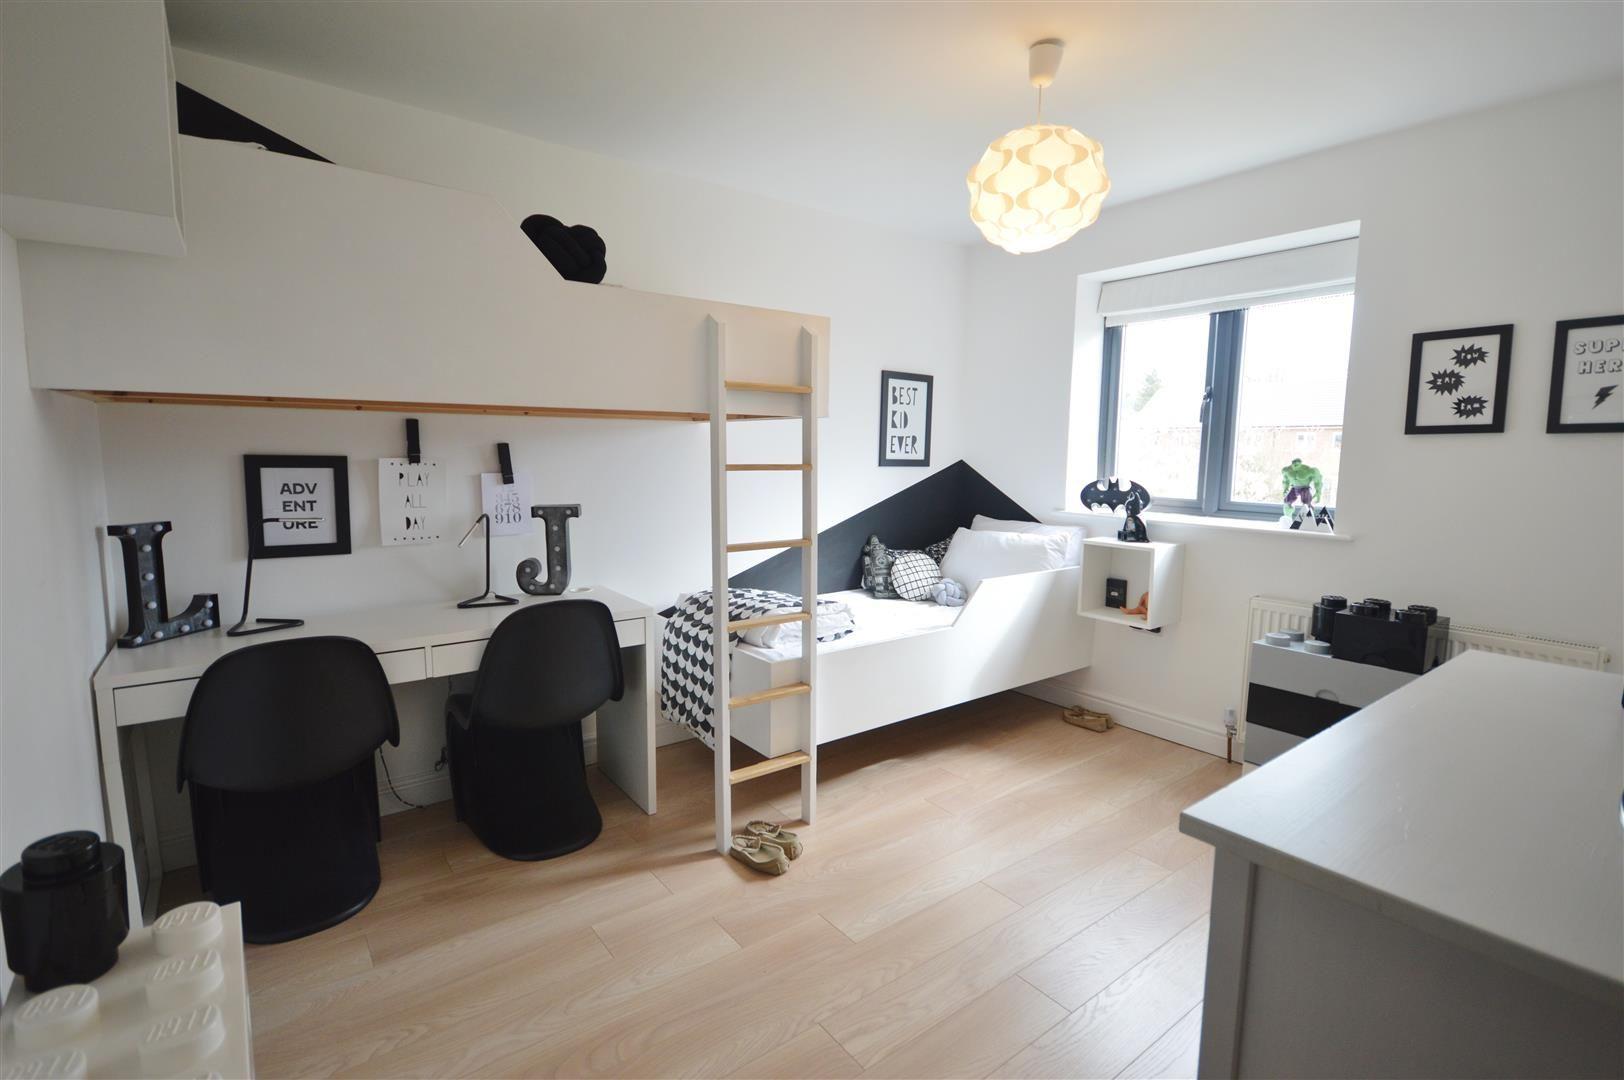 5 bed detached for sale in Leominster 11